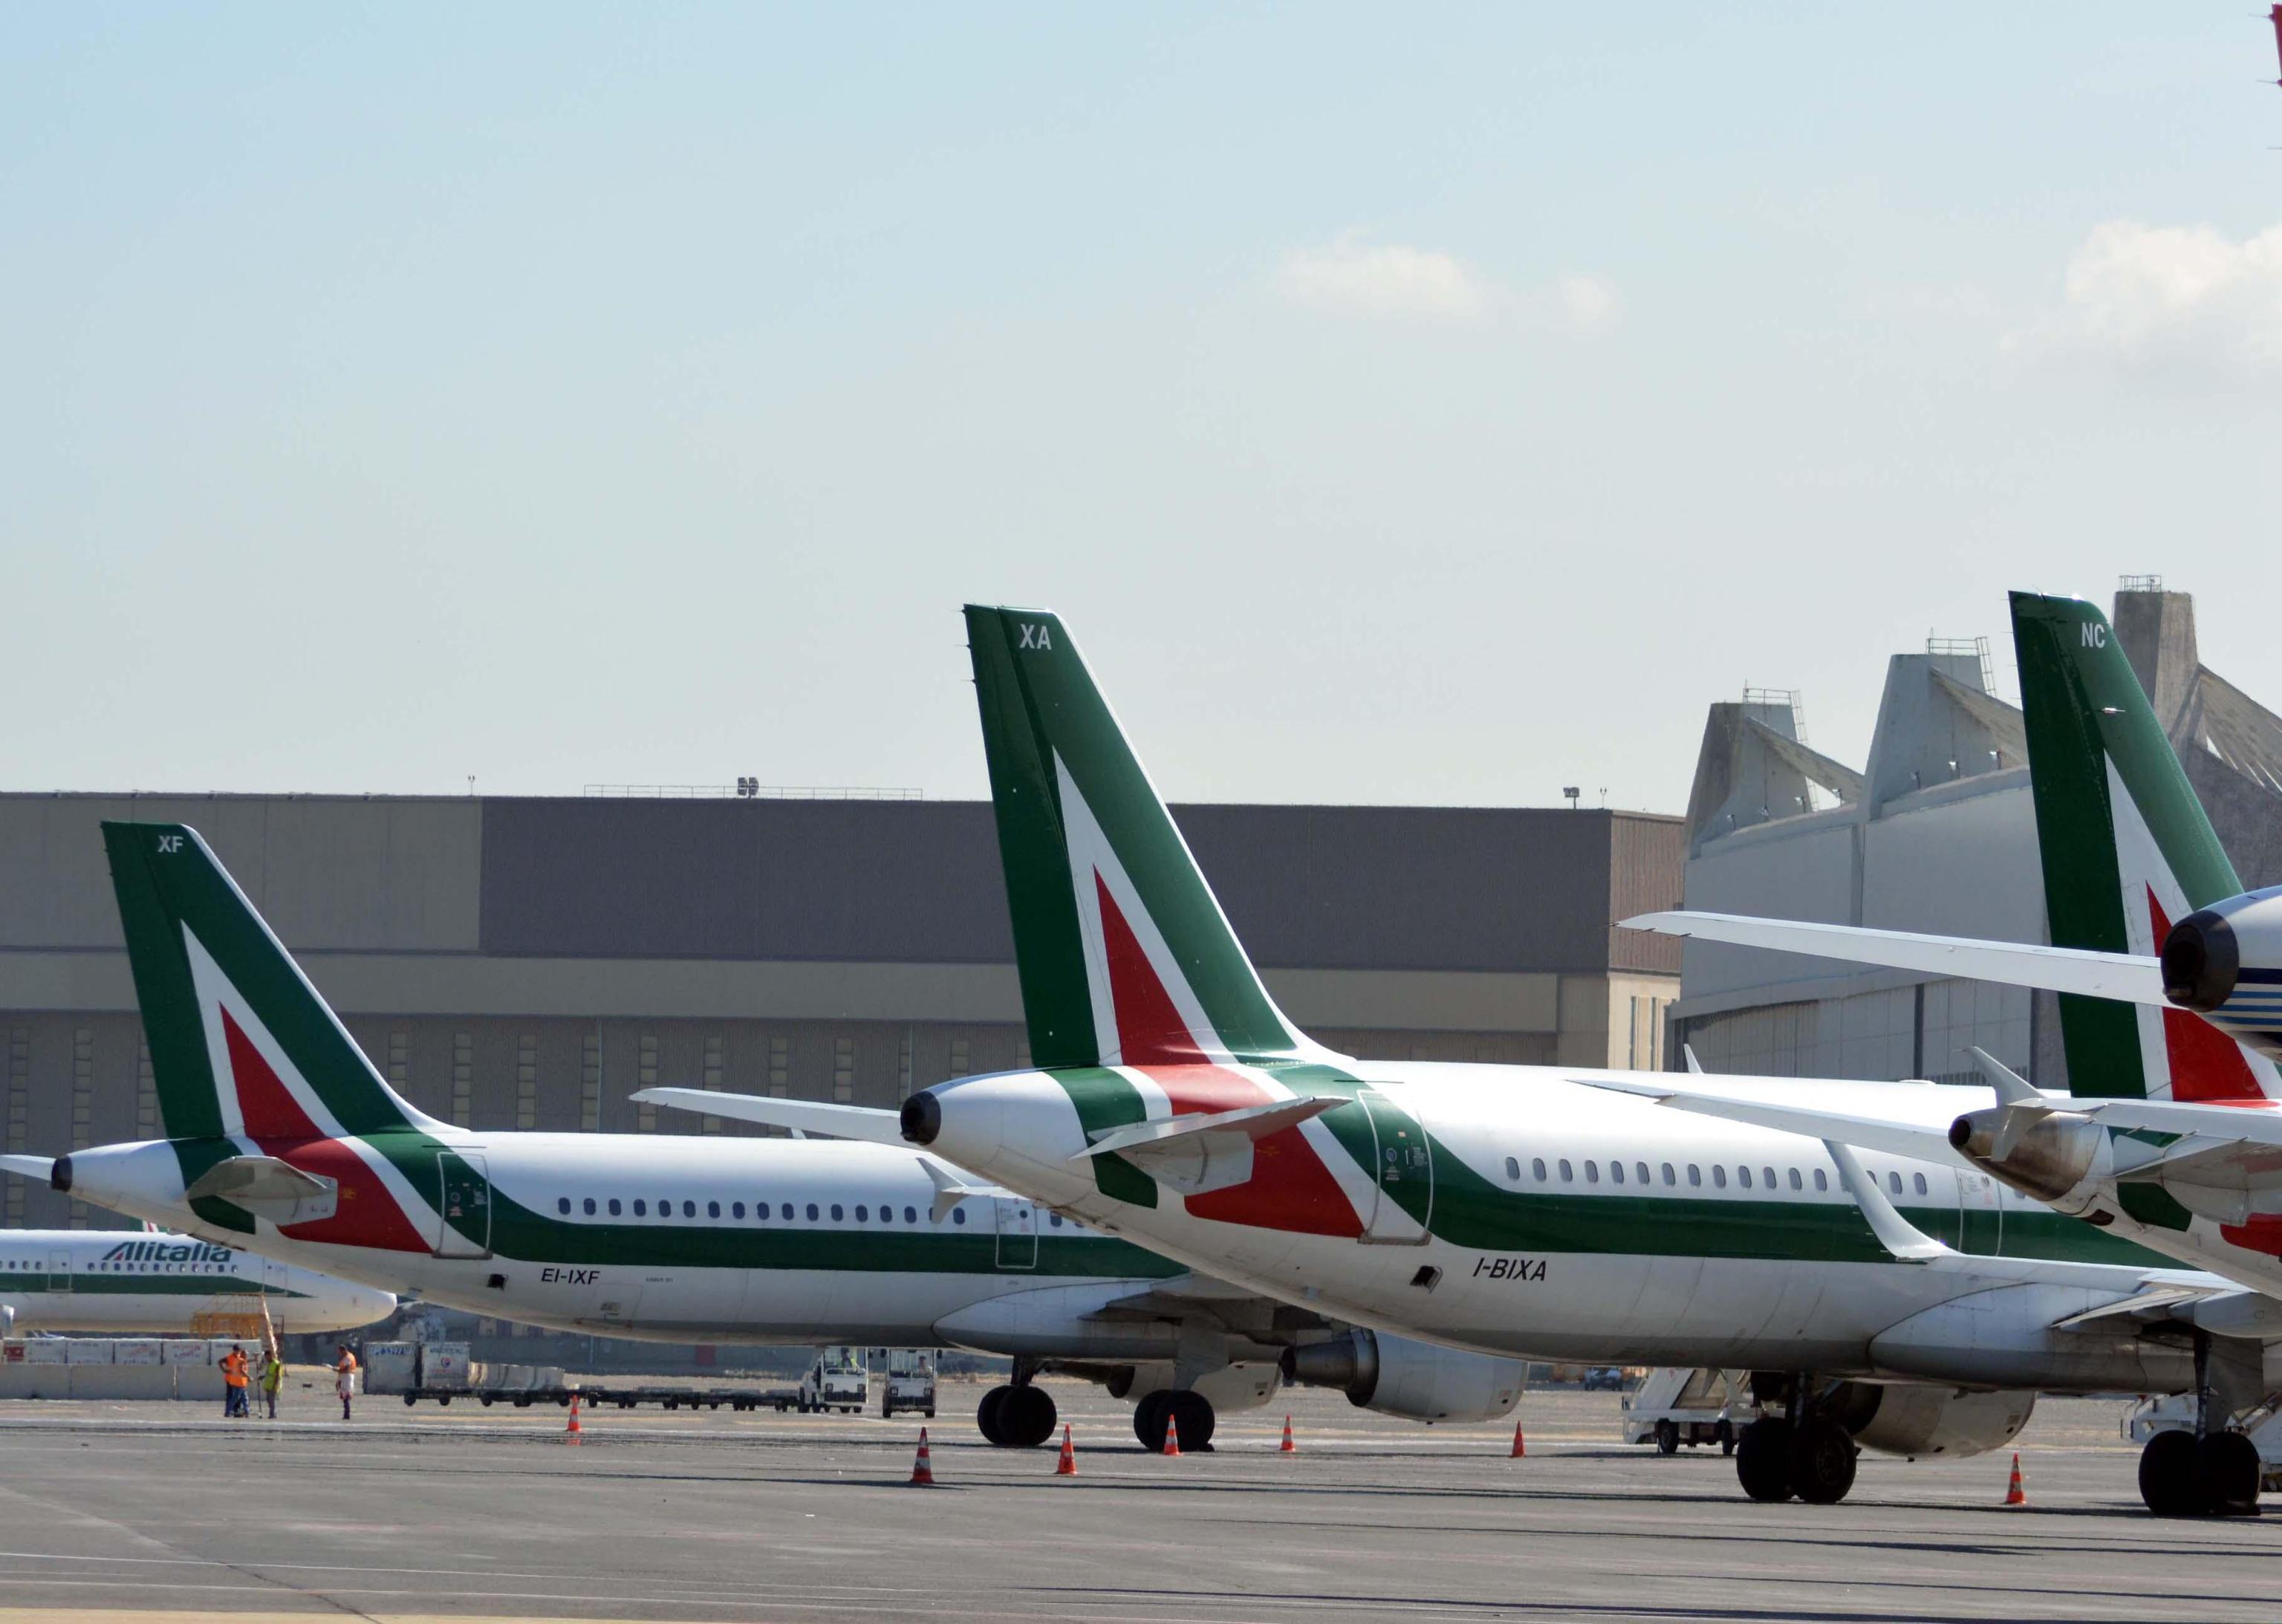 Sciopero aerei 28 maggio 2017: stop Alitalia e disagi anche a Padova, Pescara e Ancona